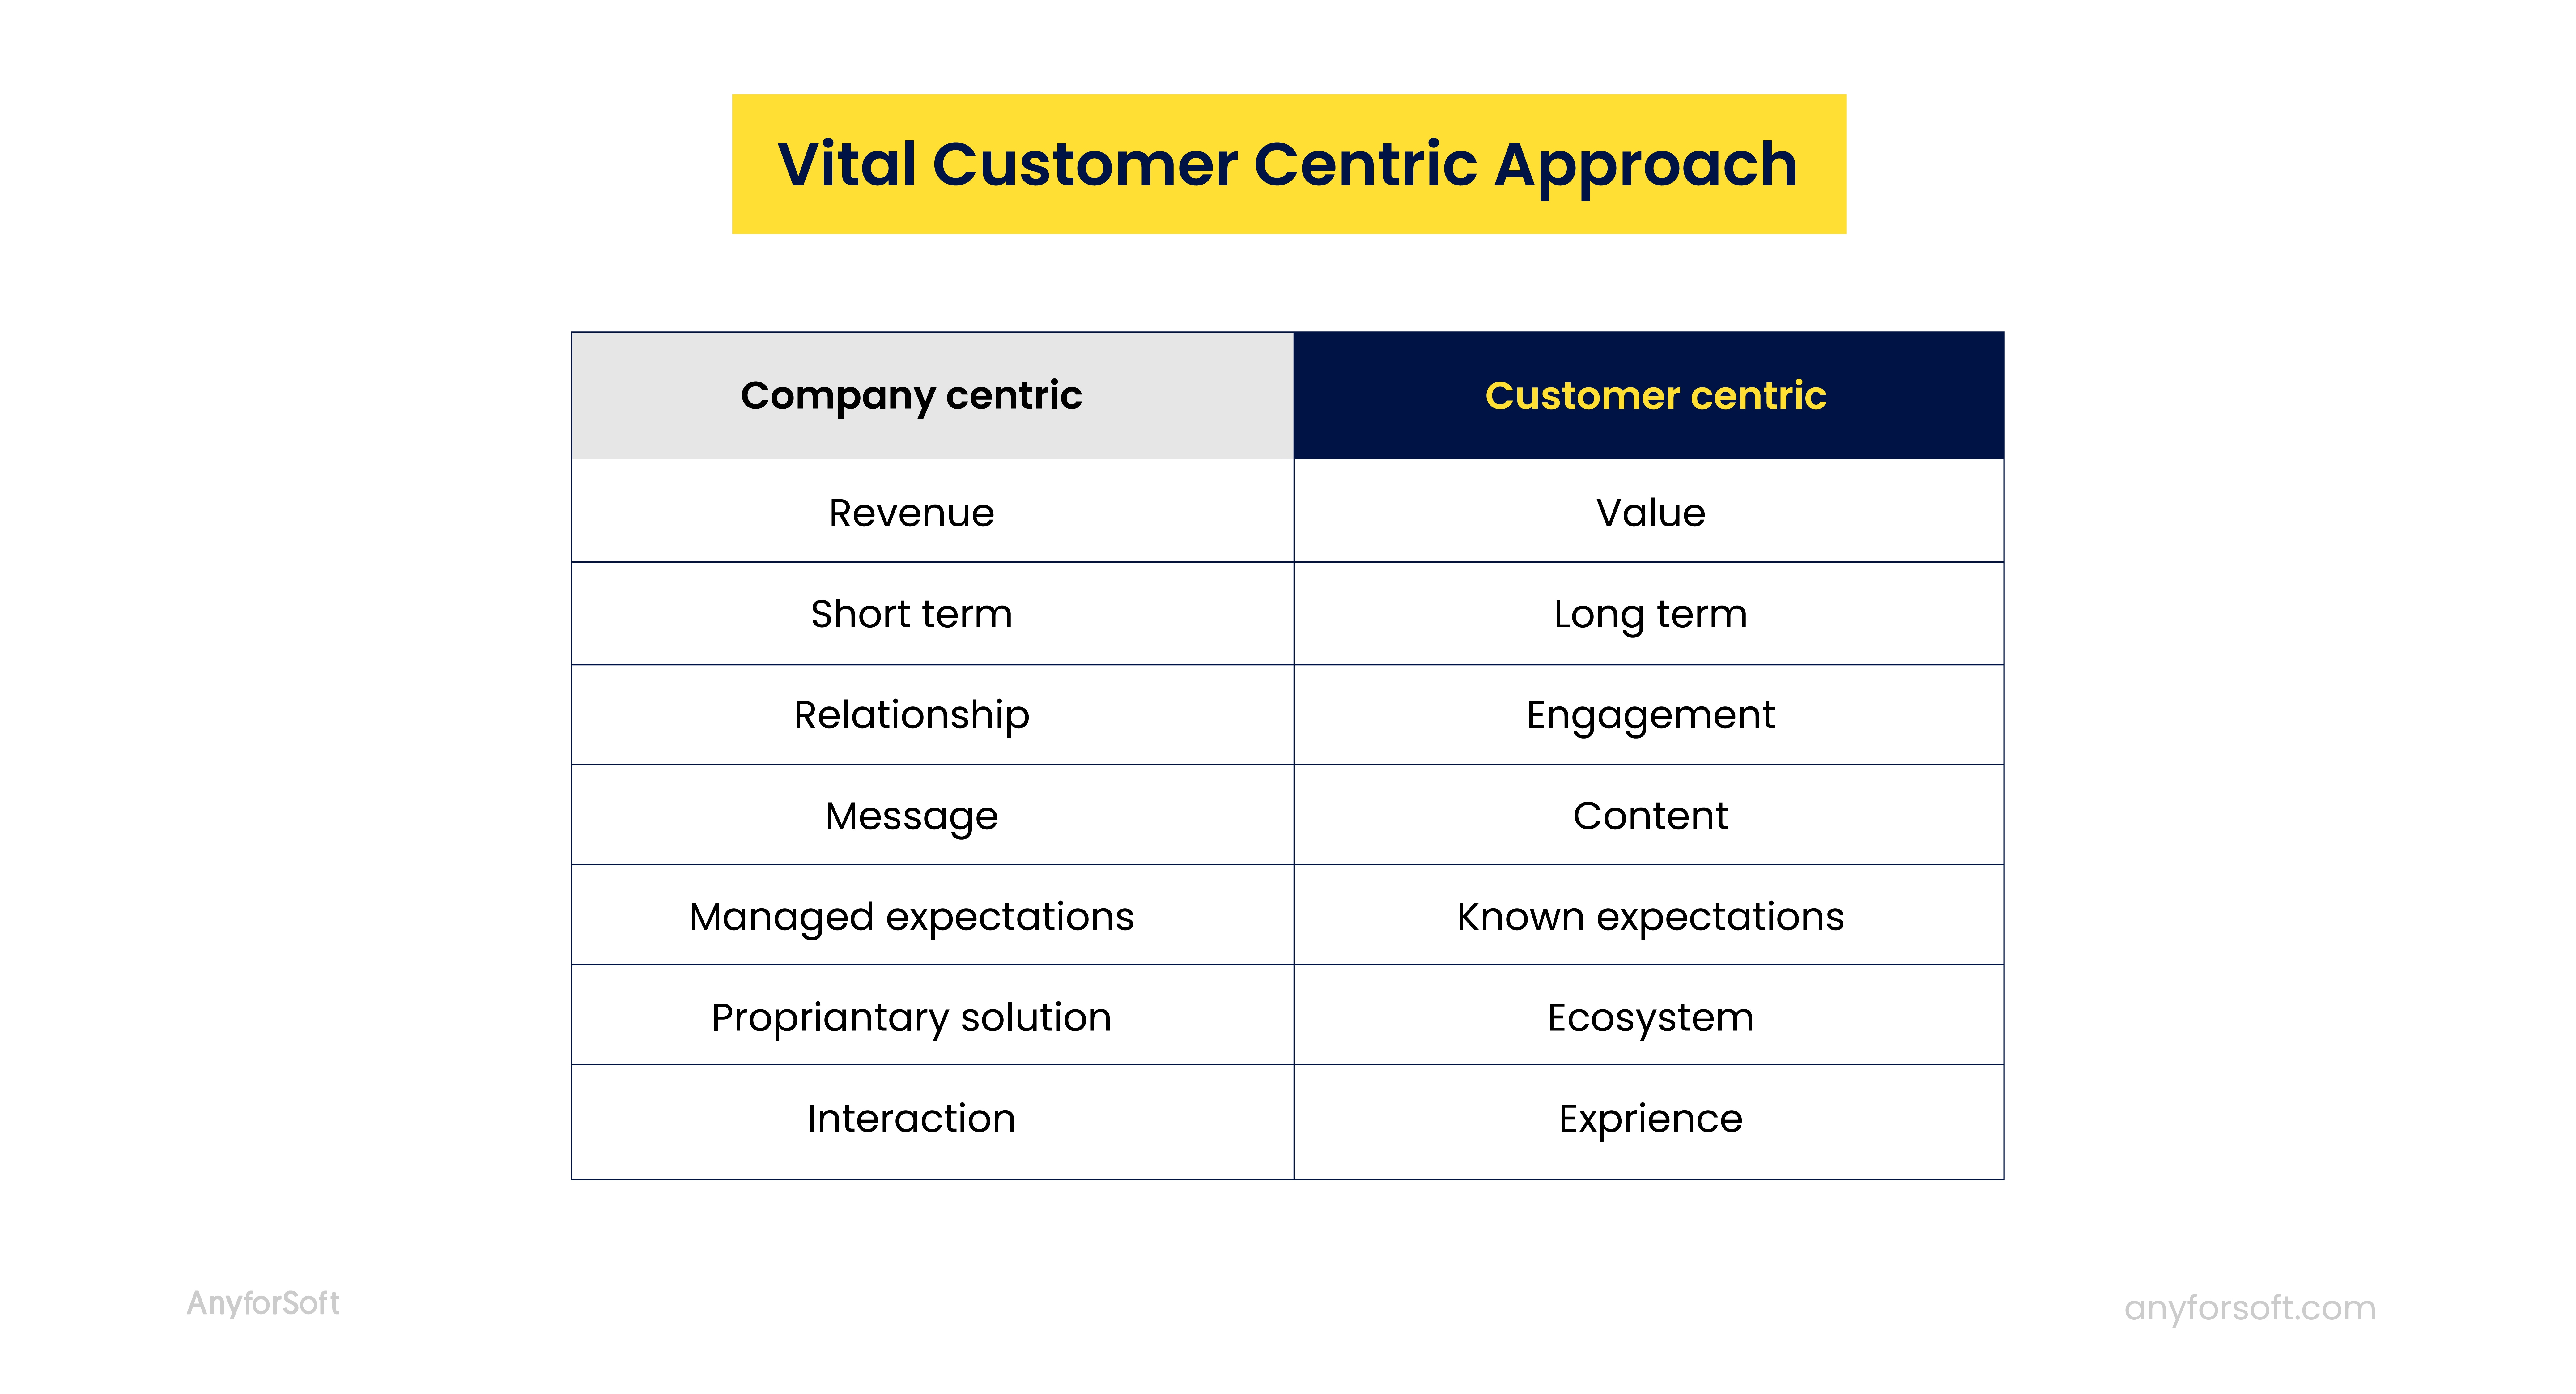 Vital customer centric approach